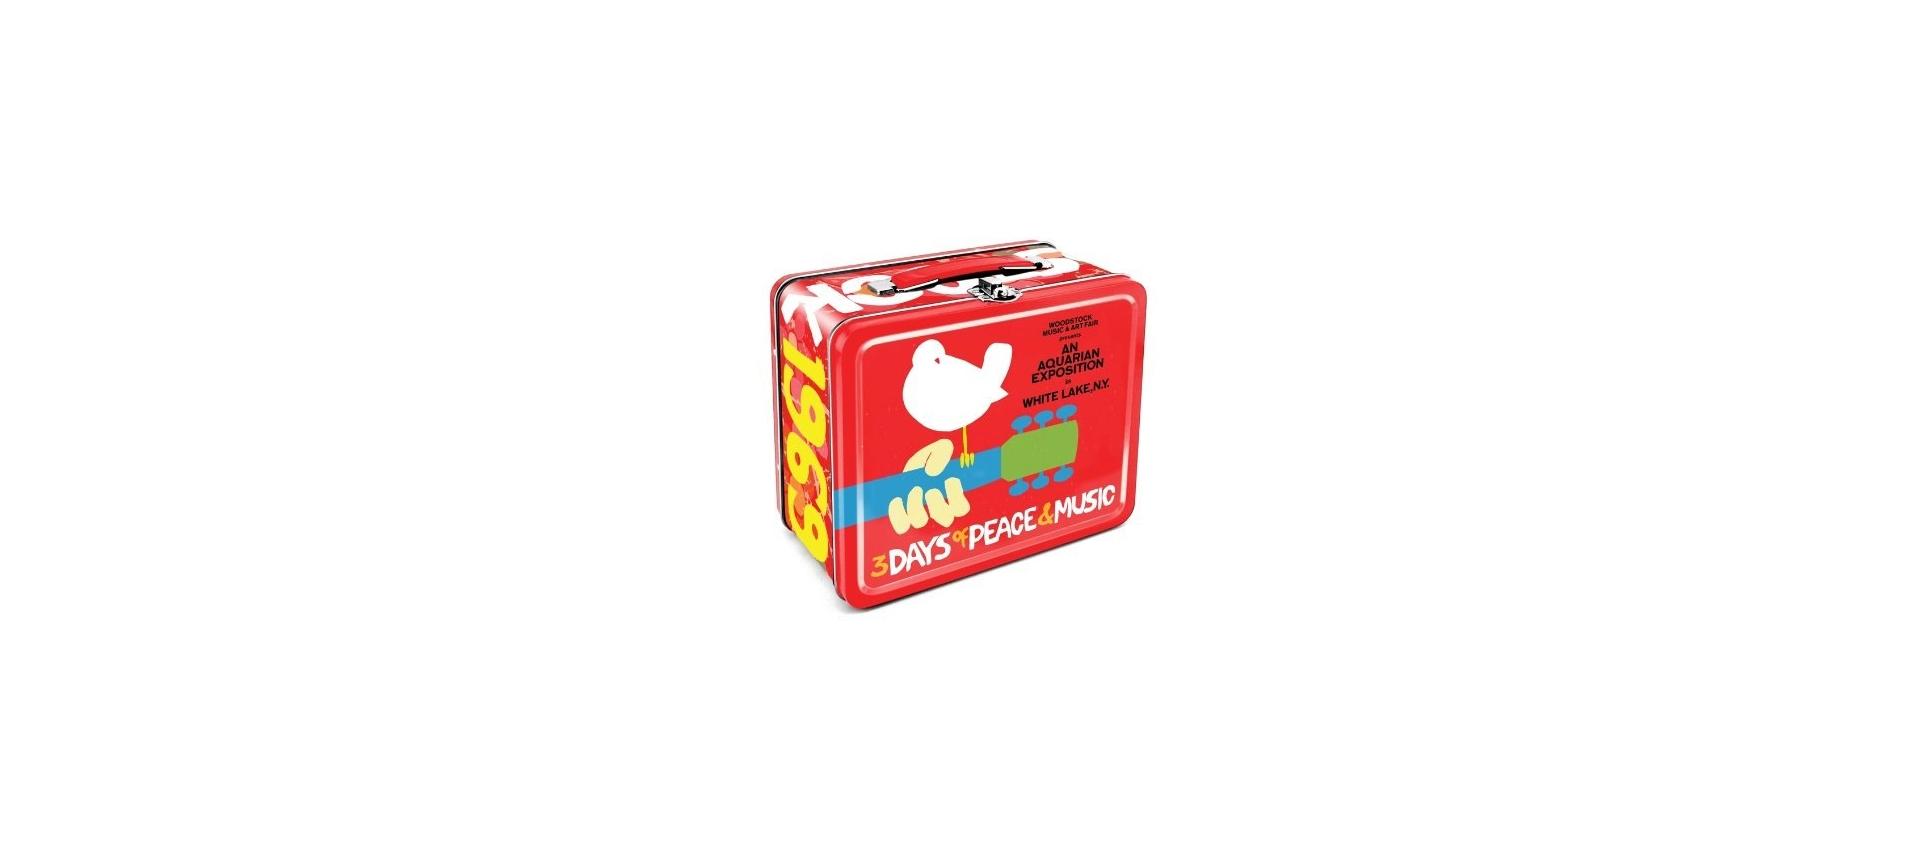 Aquarius Woodstock Metal Tin Lunch Box Luckymusic